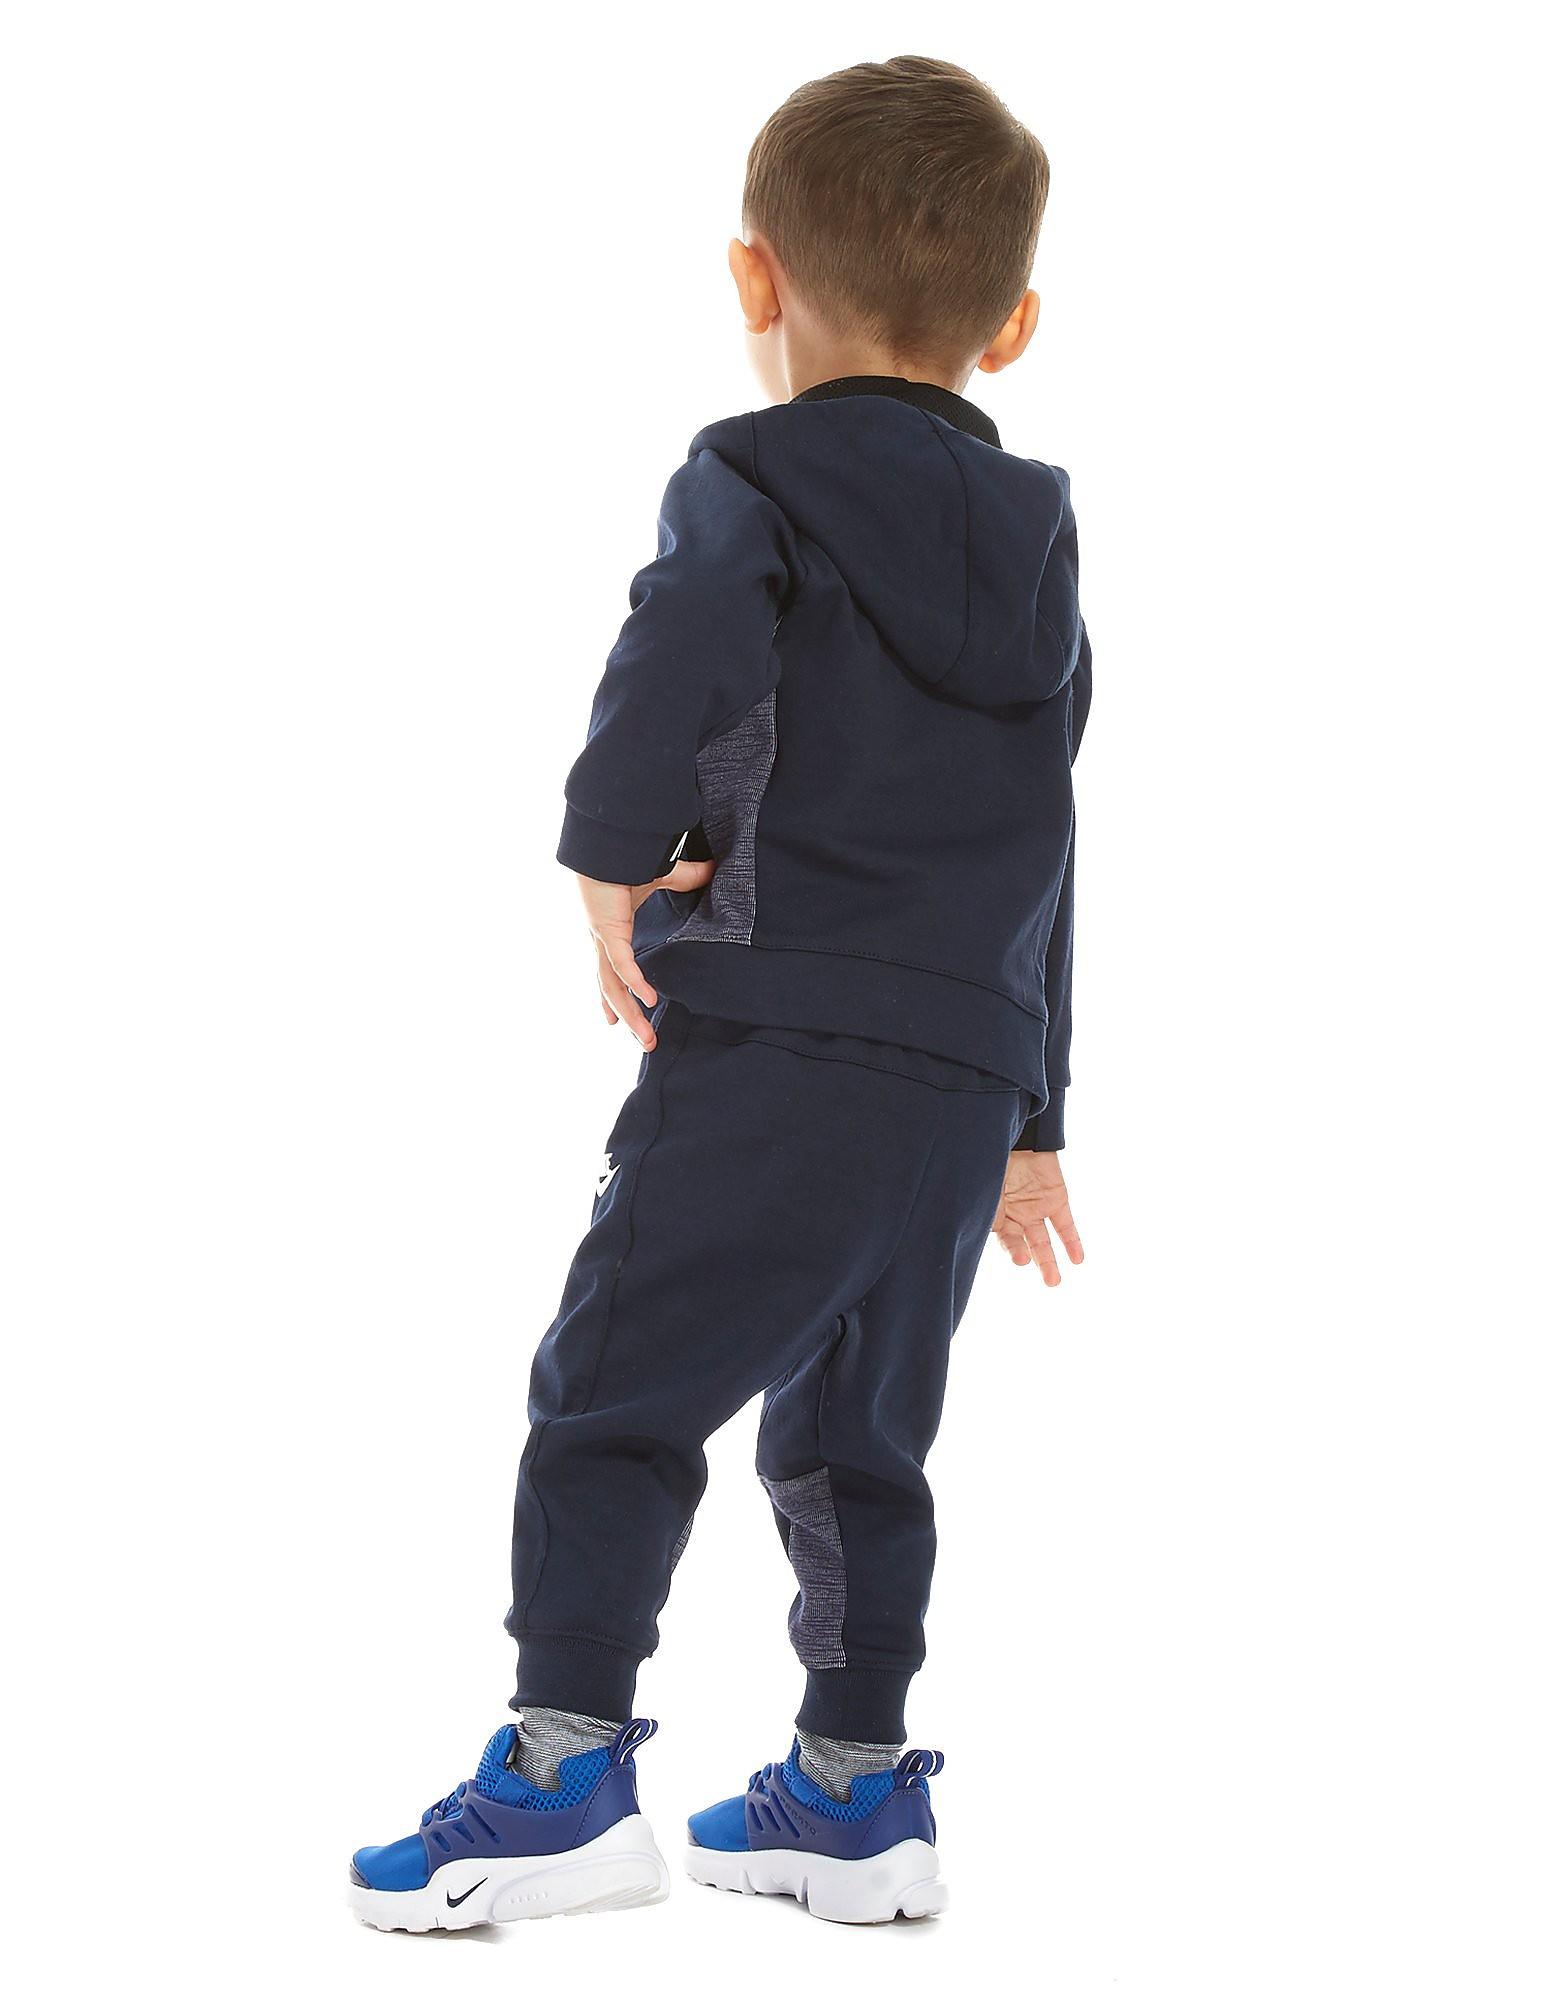 Nike Advance Full Zip Suit Infant